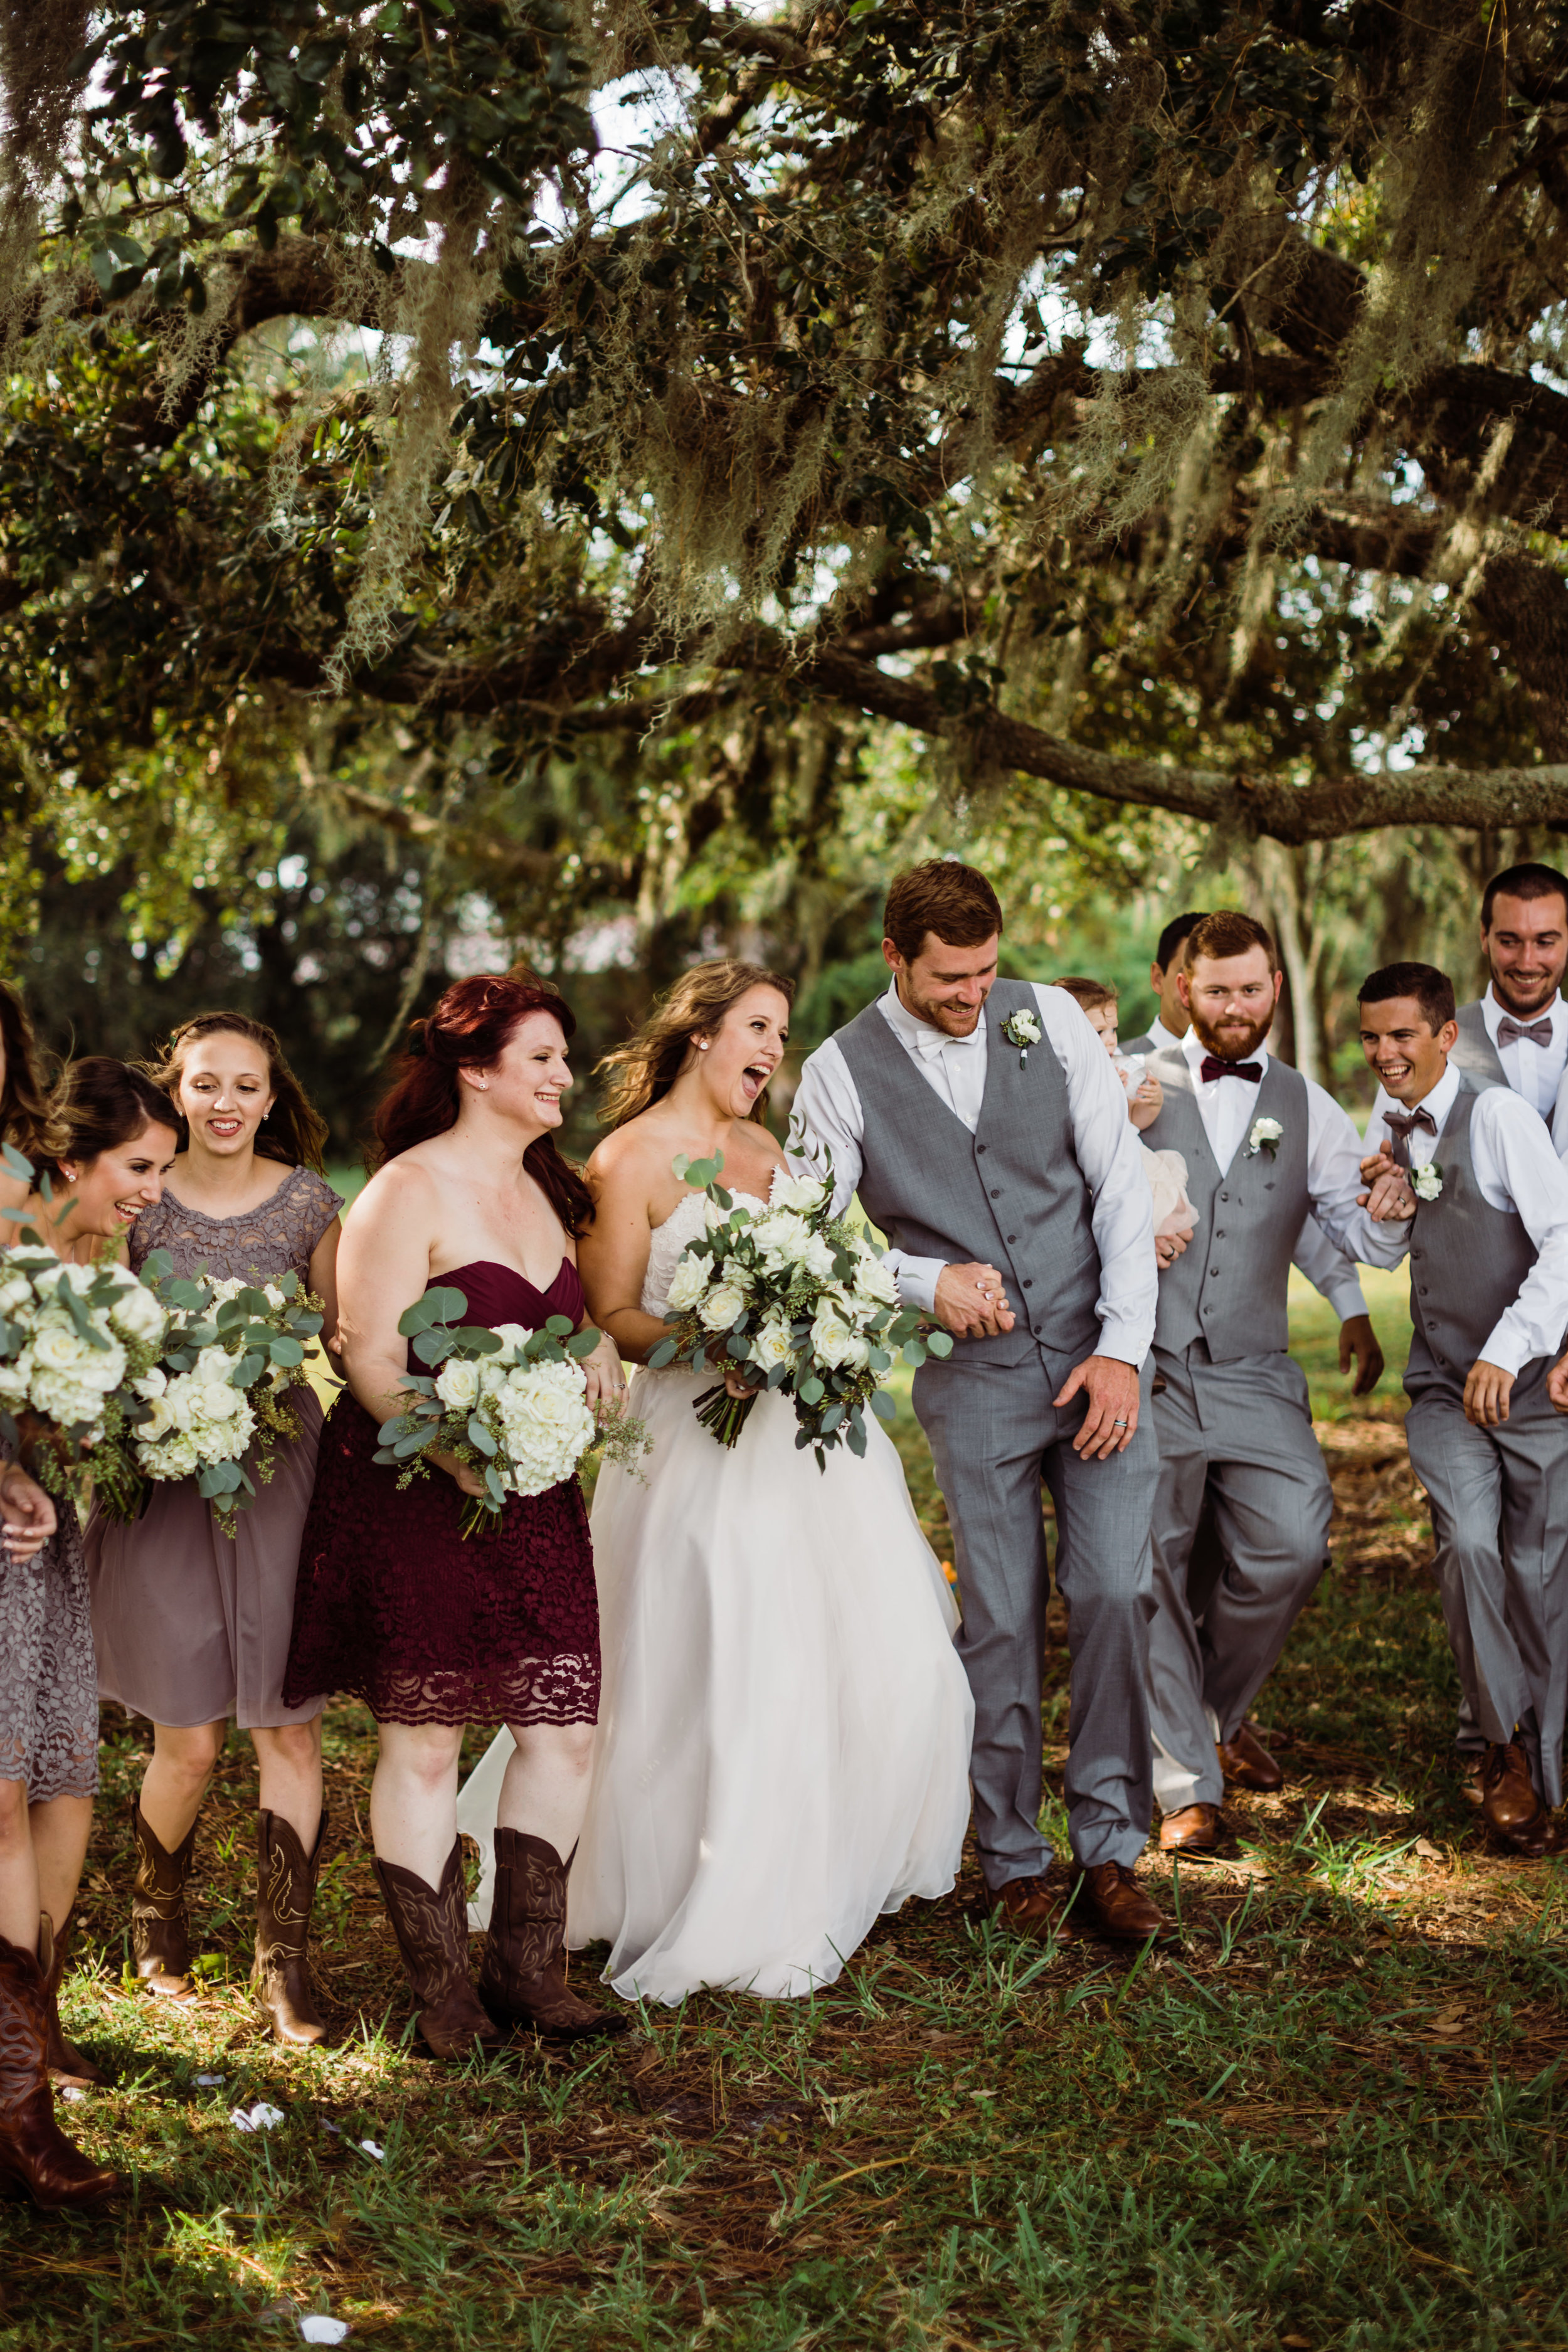 2017.10.14 Samantha and Matthew Crabtree Sarasota Wedding (255 of 708).jpg